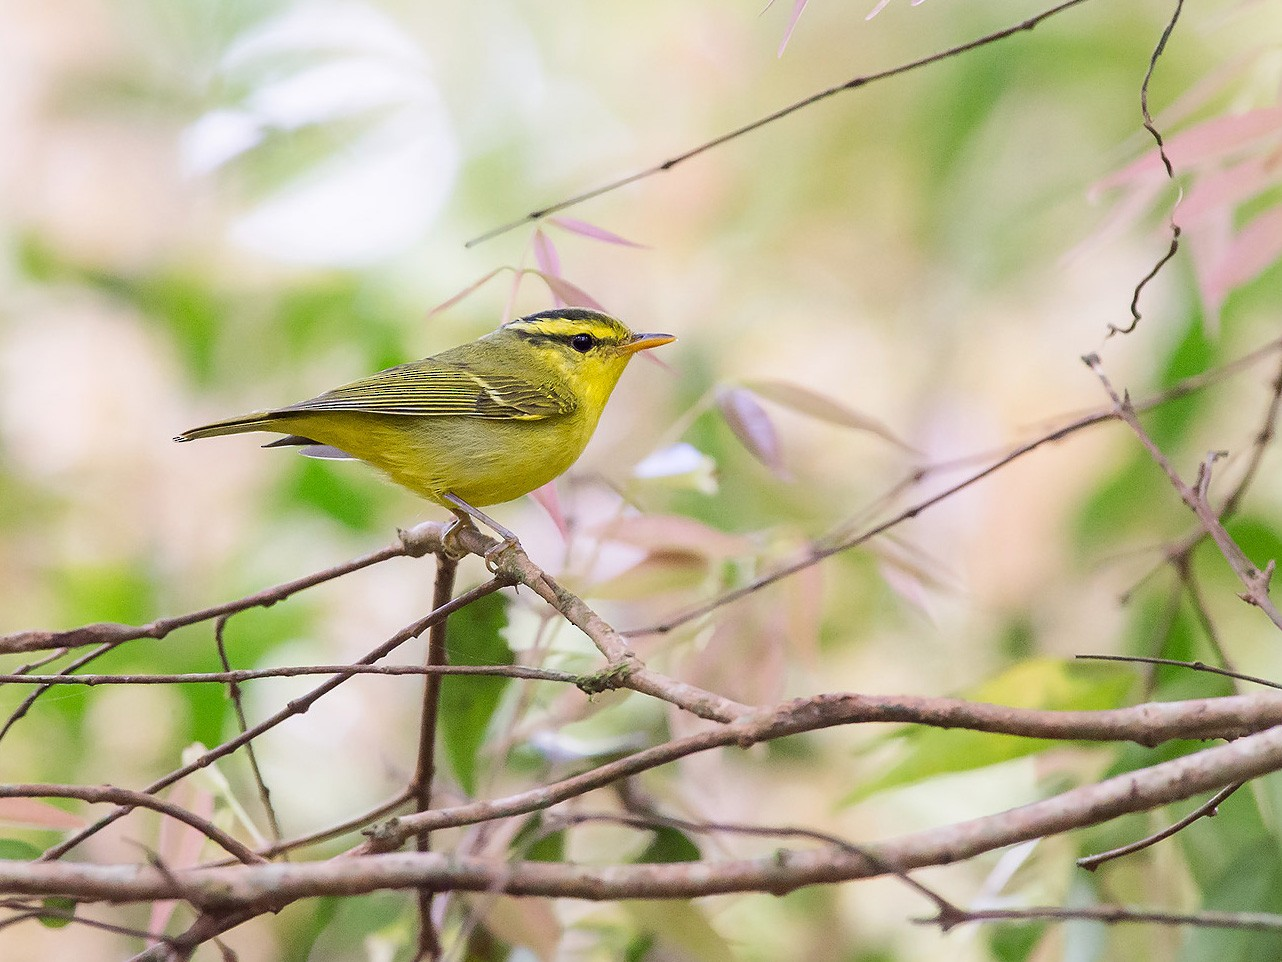 Sulphur-breasted Warbler - Natthaphat Chotjuckdikul